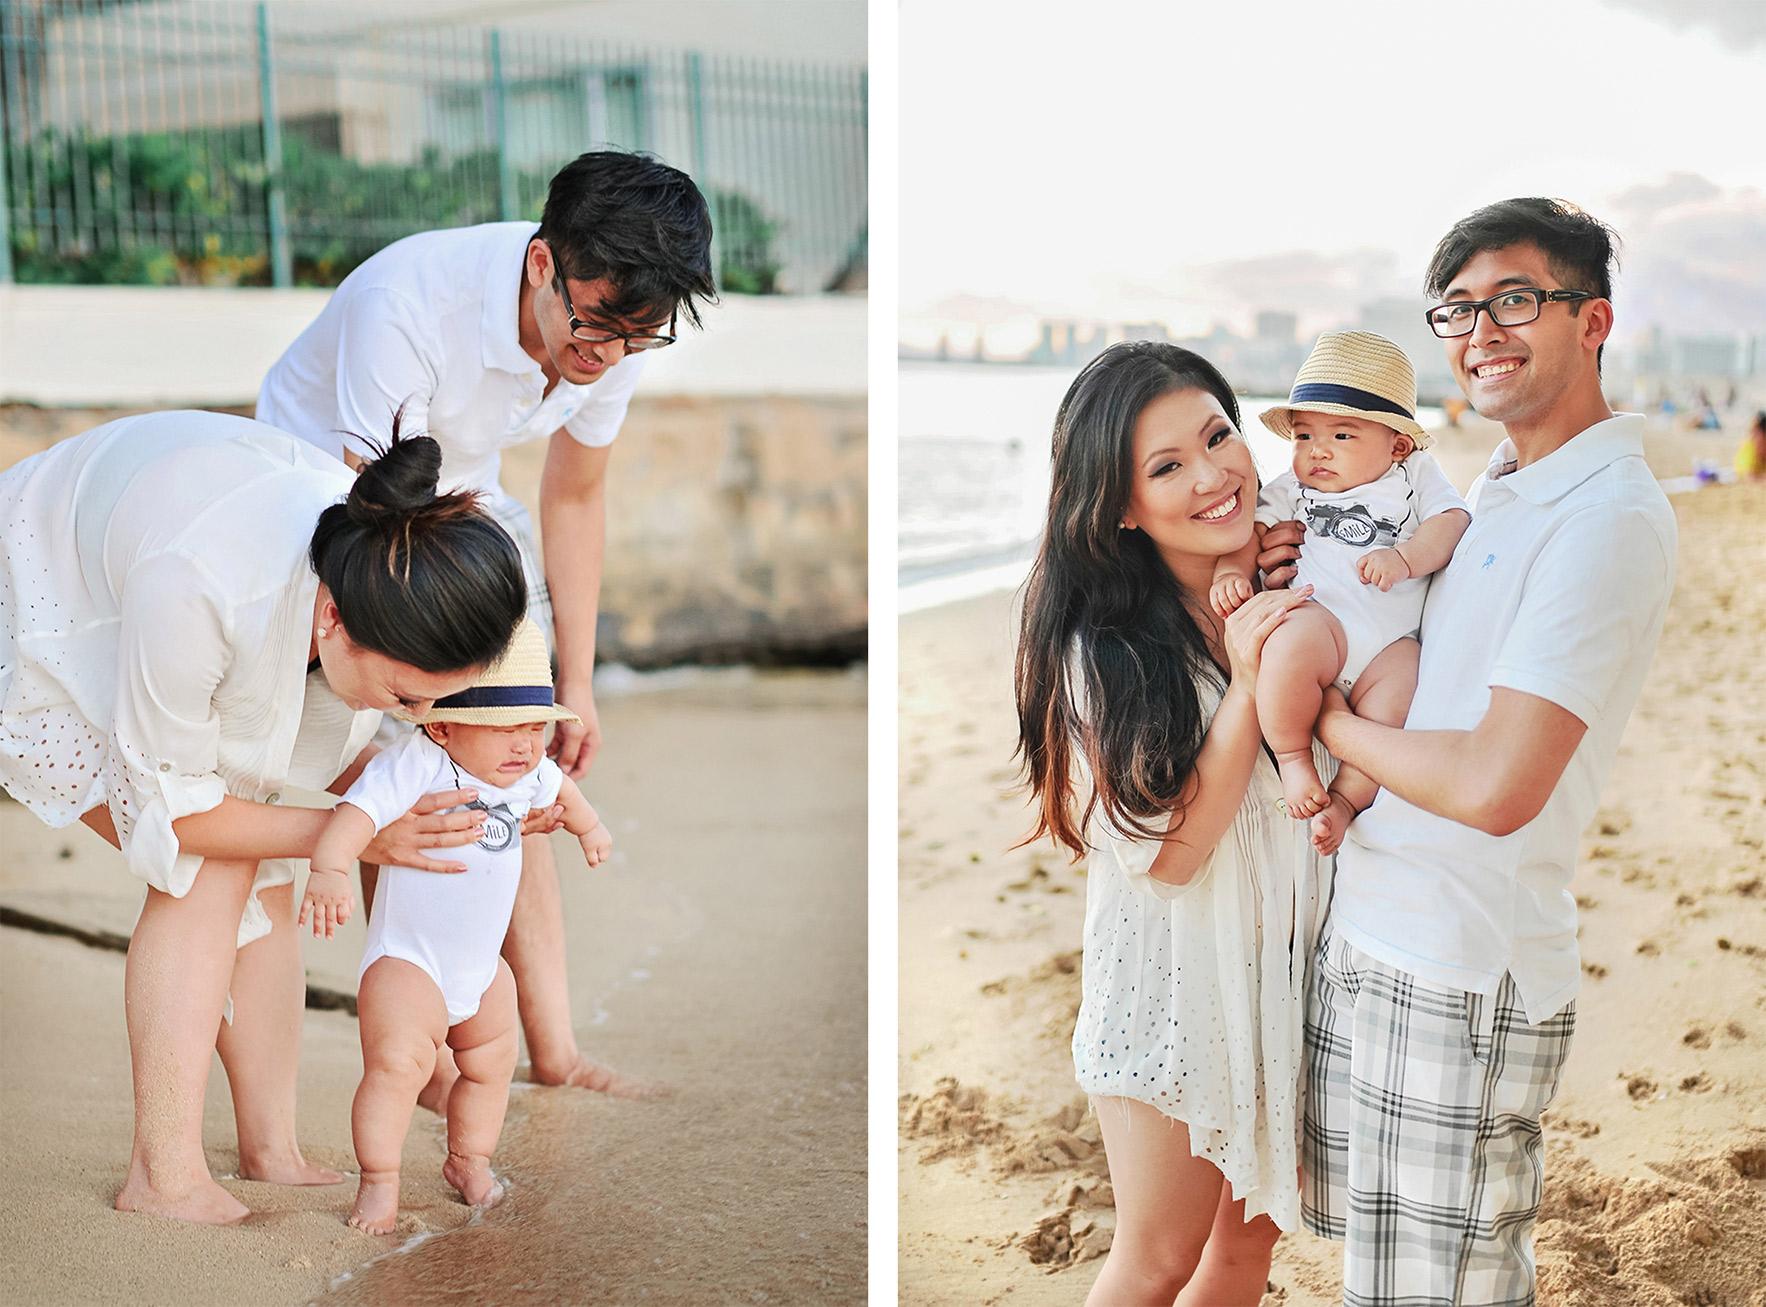 family-photo-oahu-hawaii-waikiki-beach-7-stephen-ludwig.jpg